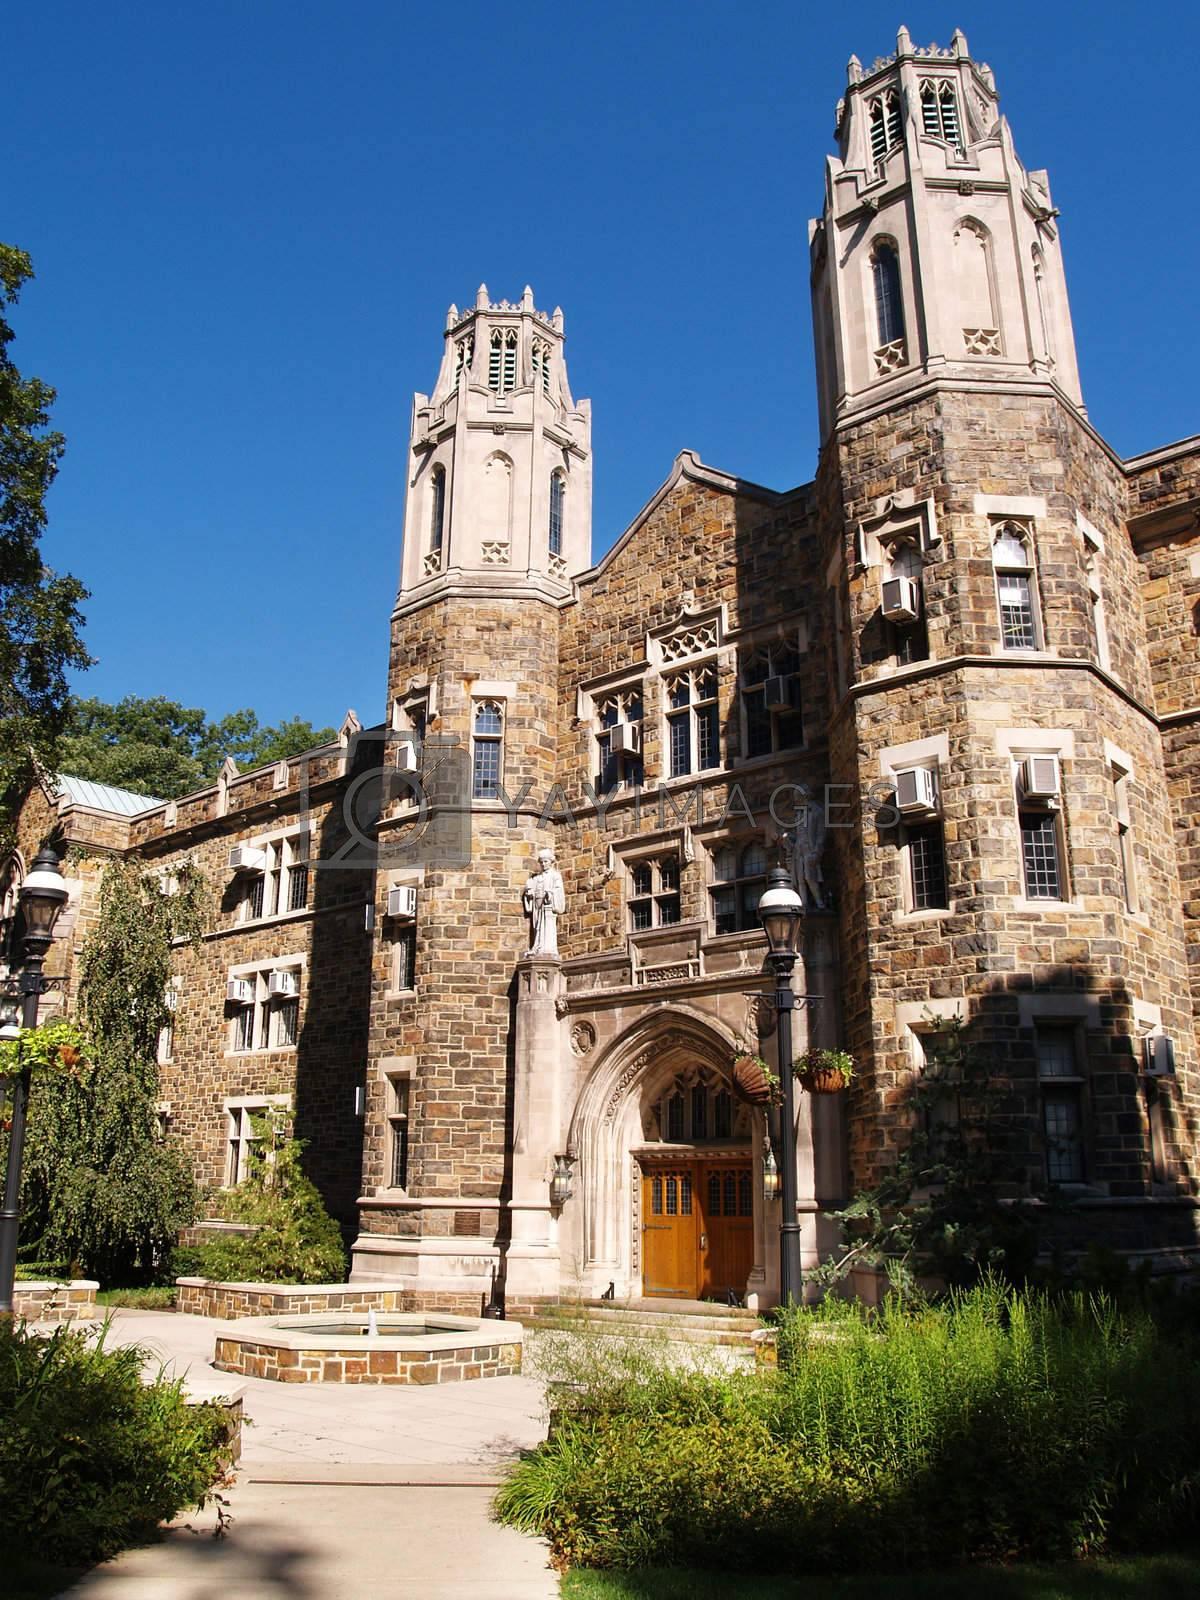 Packard Laboratory on the campus of Lehigh University in Bethlehem, Pennsylvania